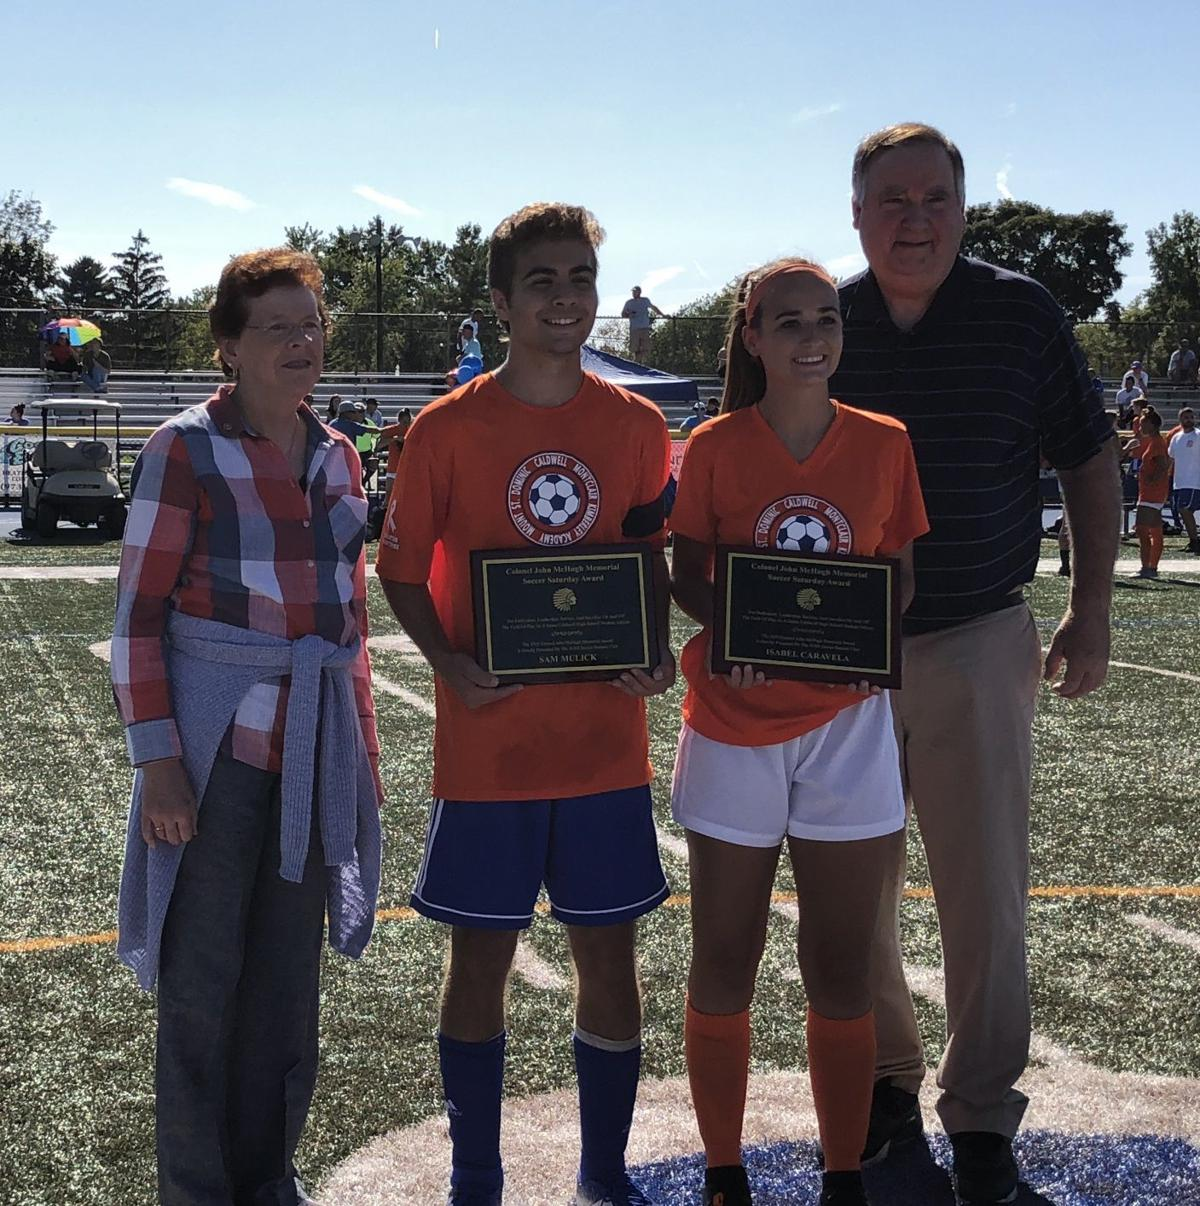 Col. John McHugh Memorial Awards